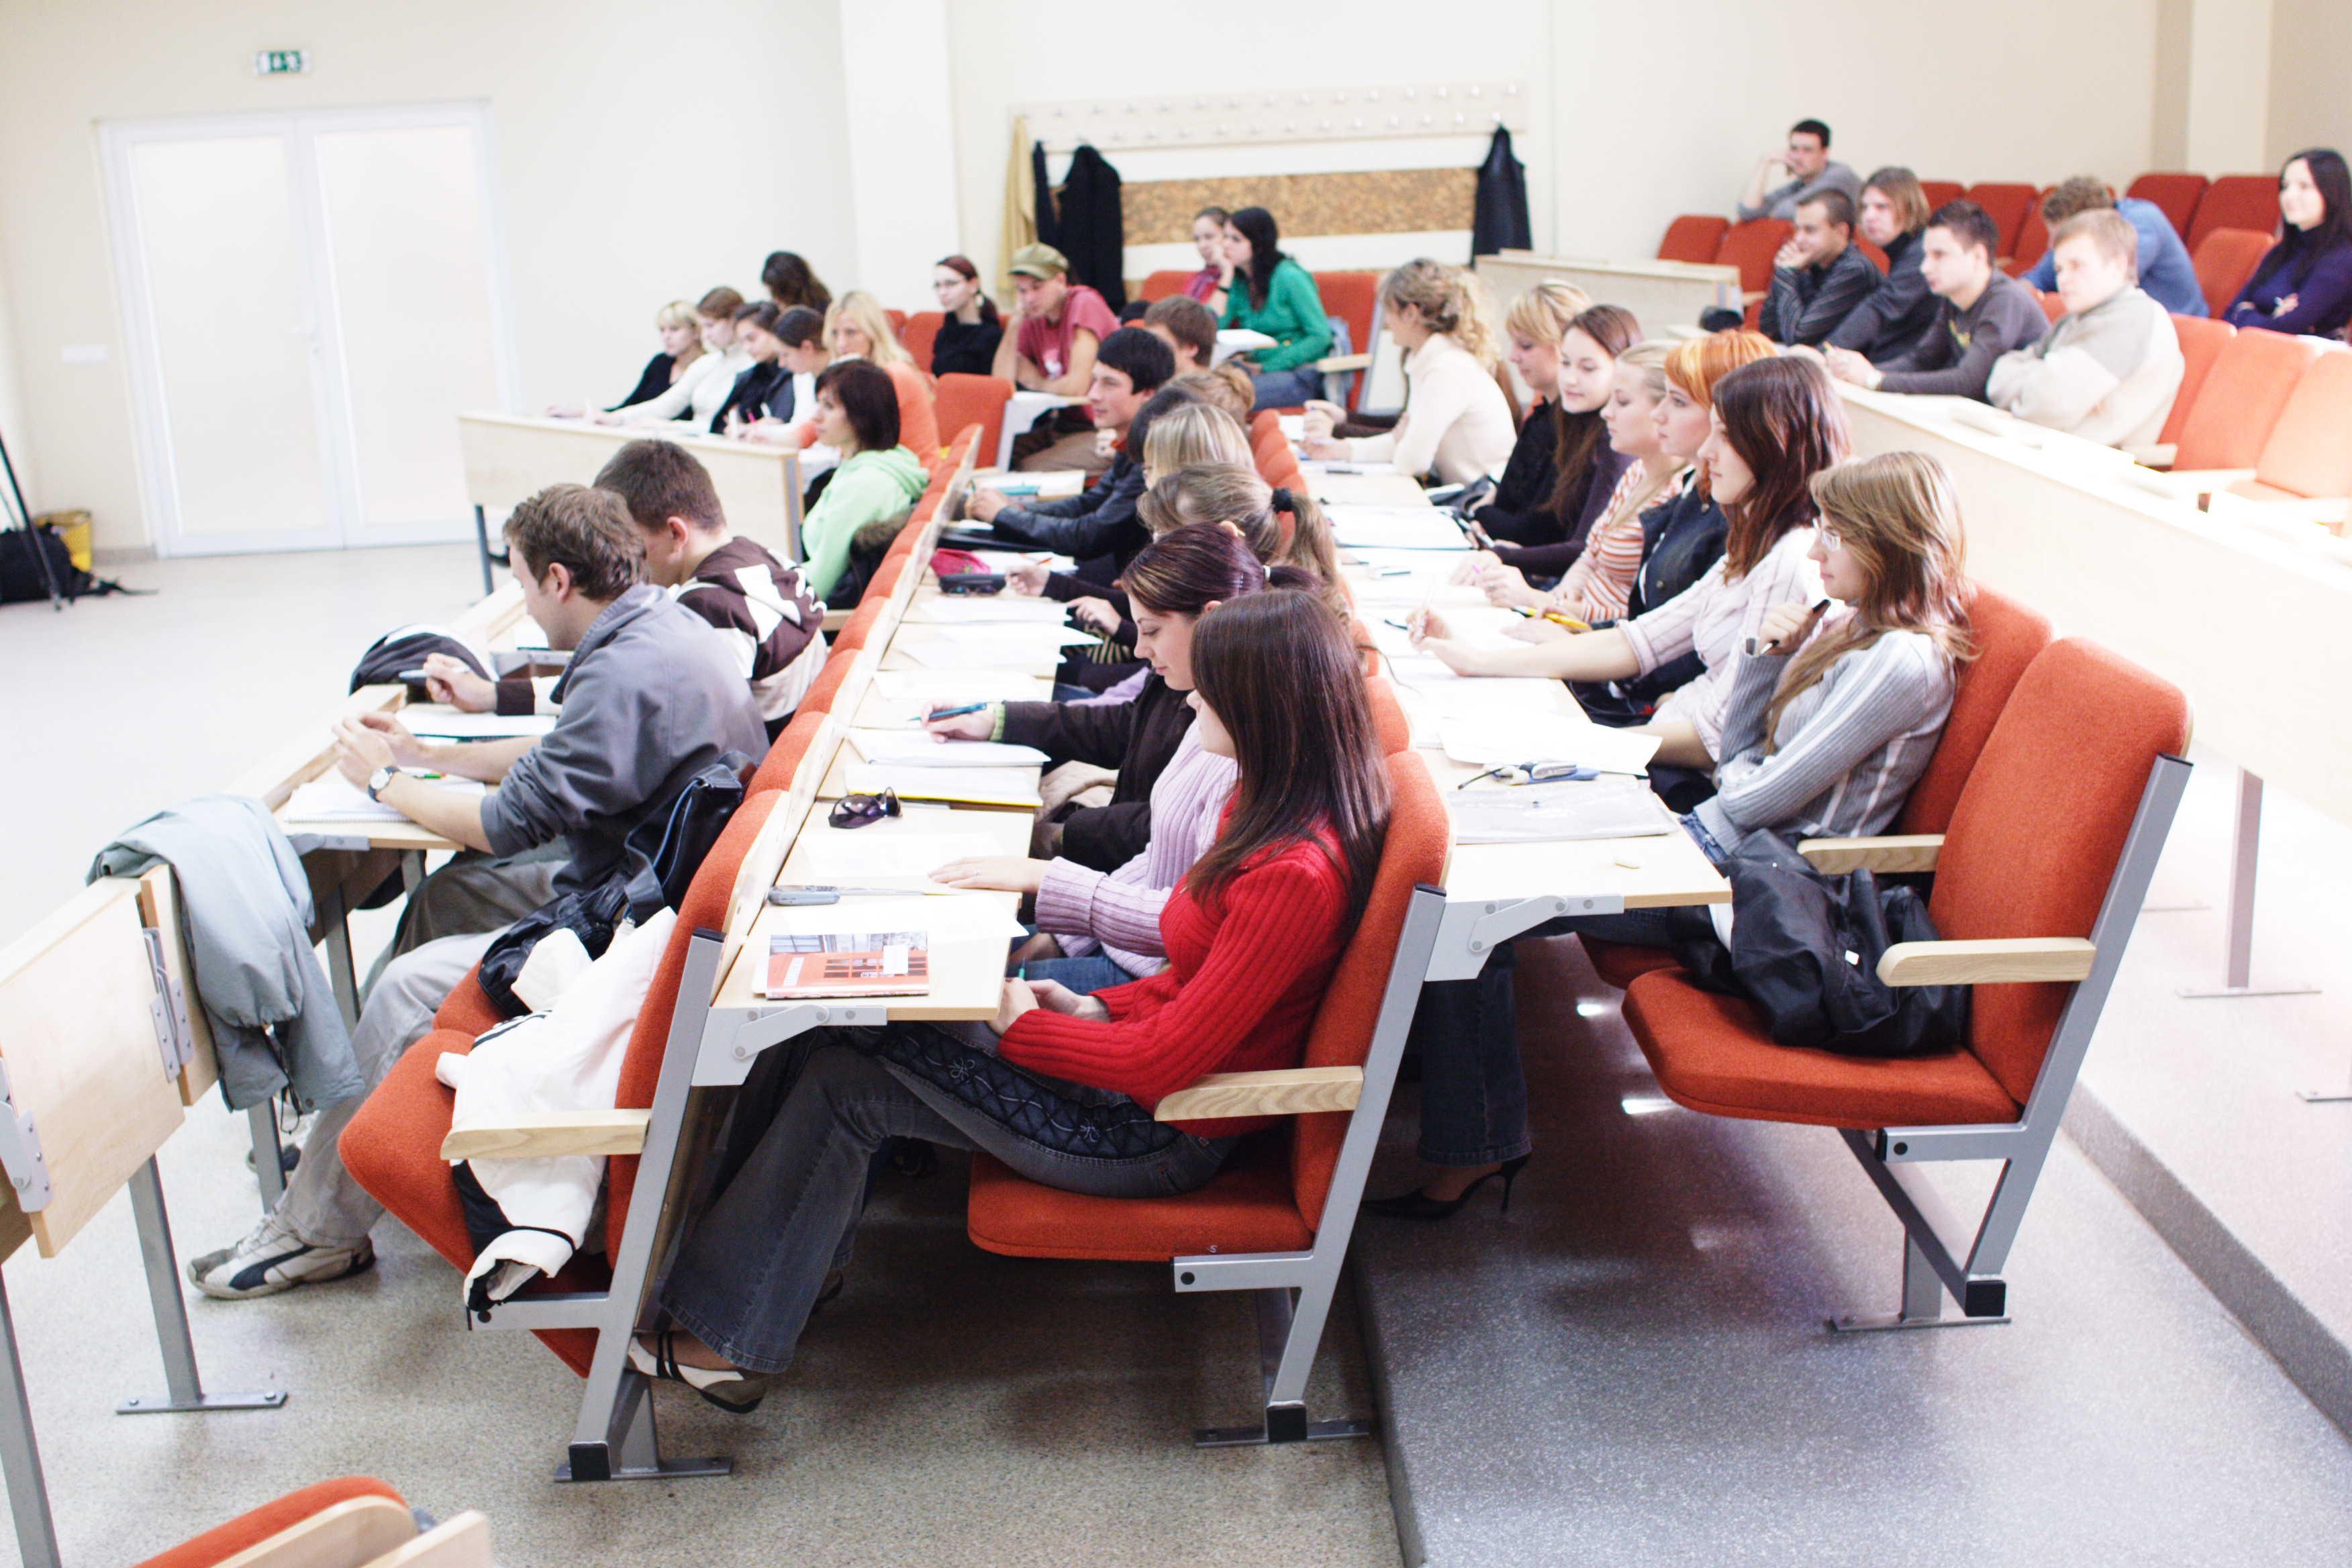 File:Class in IBS (Vilnius University).JPG - Wikimedia Commons